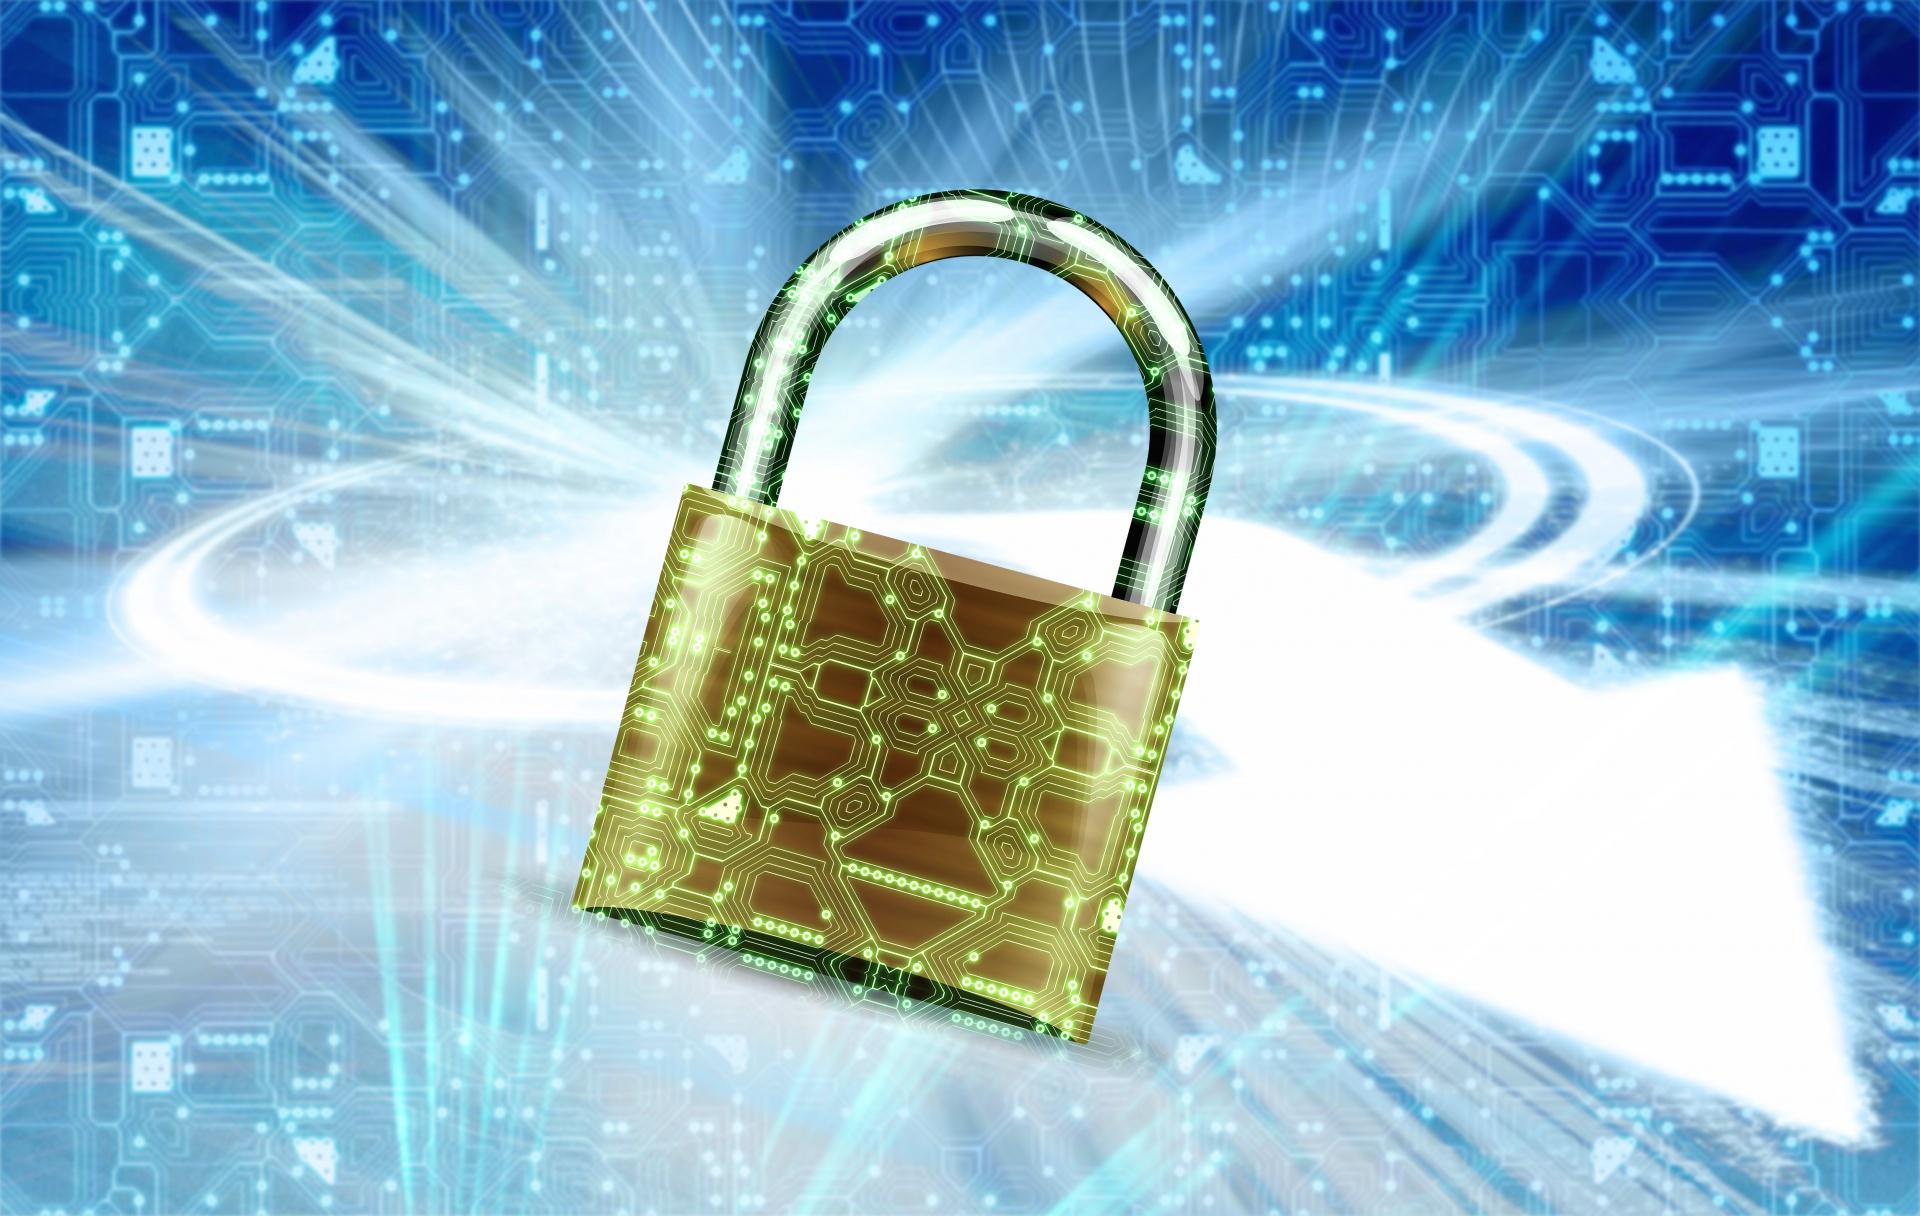 Electronically secure.  Image credit: Flash Alexander via PublicDomainPictures.net